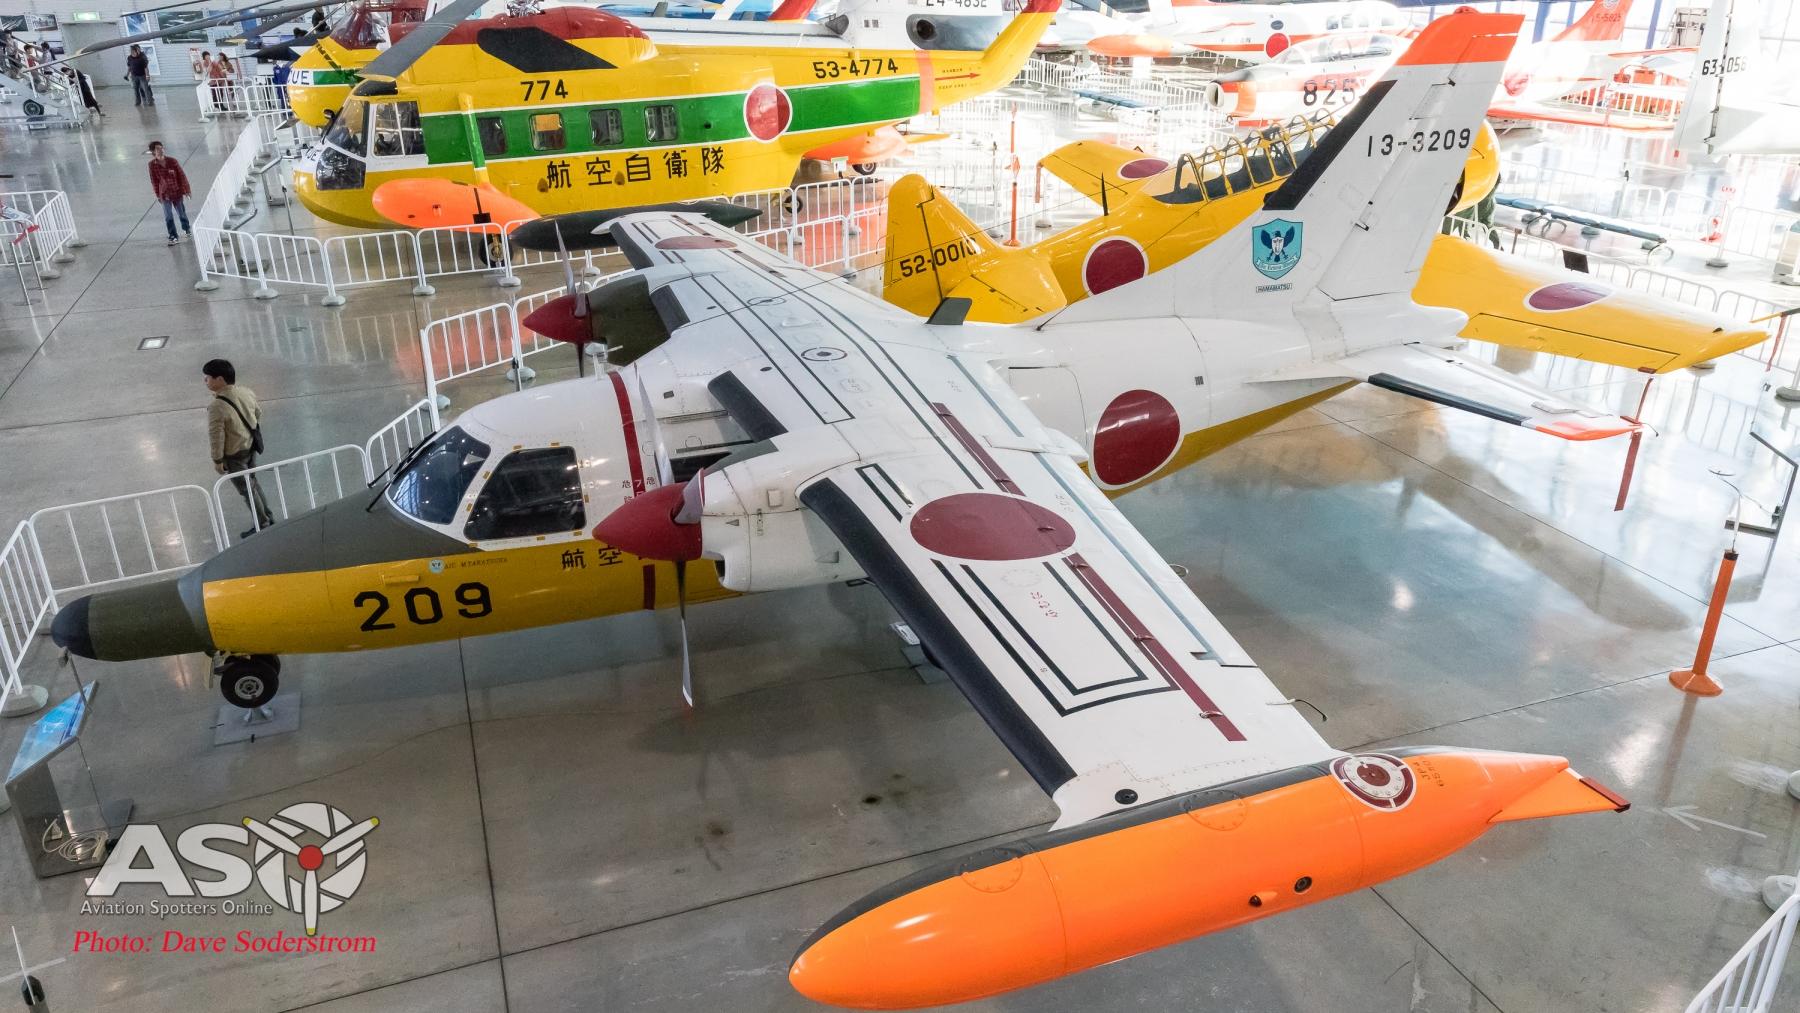 JASDF-Museum-26-1-of-1